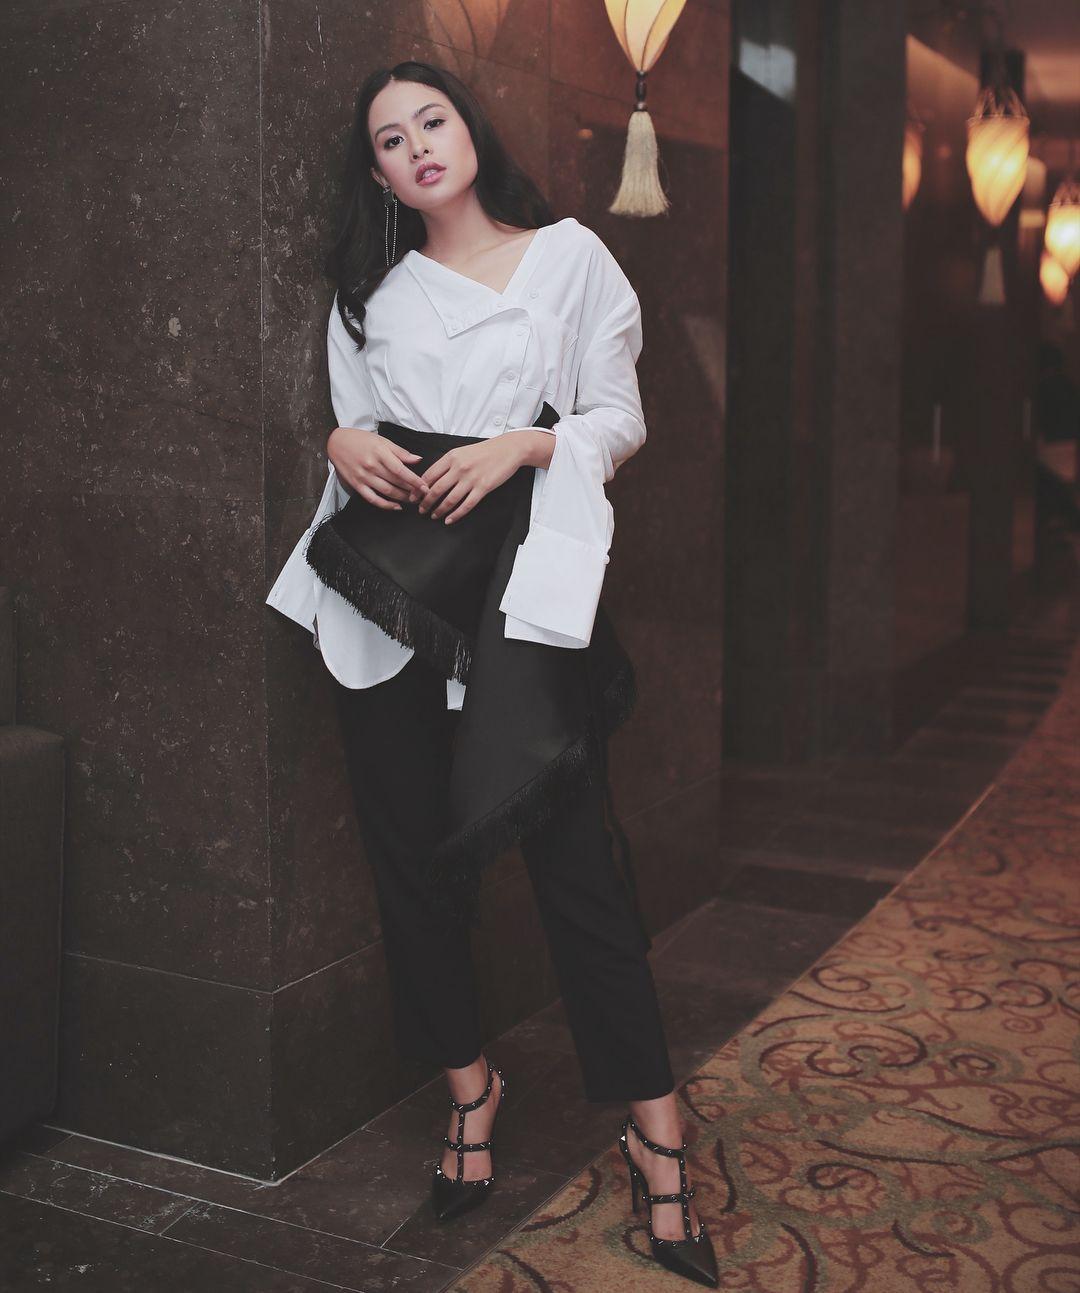 5 Inspirasi Tampil Formal Chic A la Maudy Ayunda